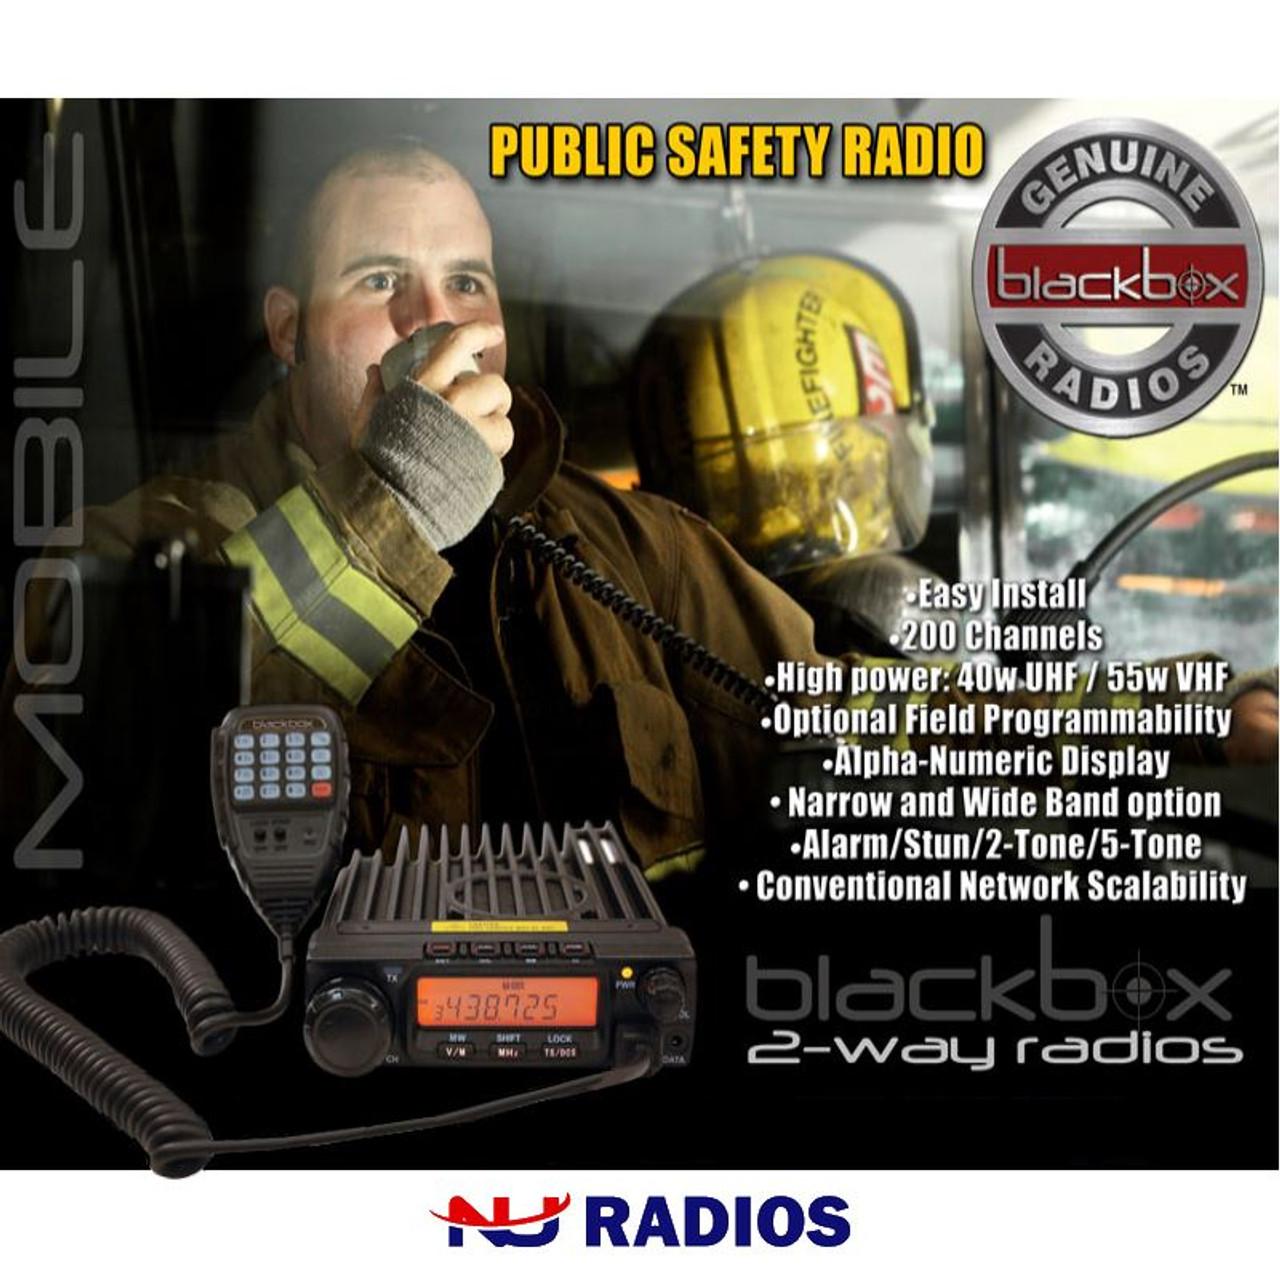 Blackbox Mobile 200 Channel 40 Watt UHF 2-Way Radio